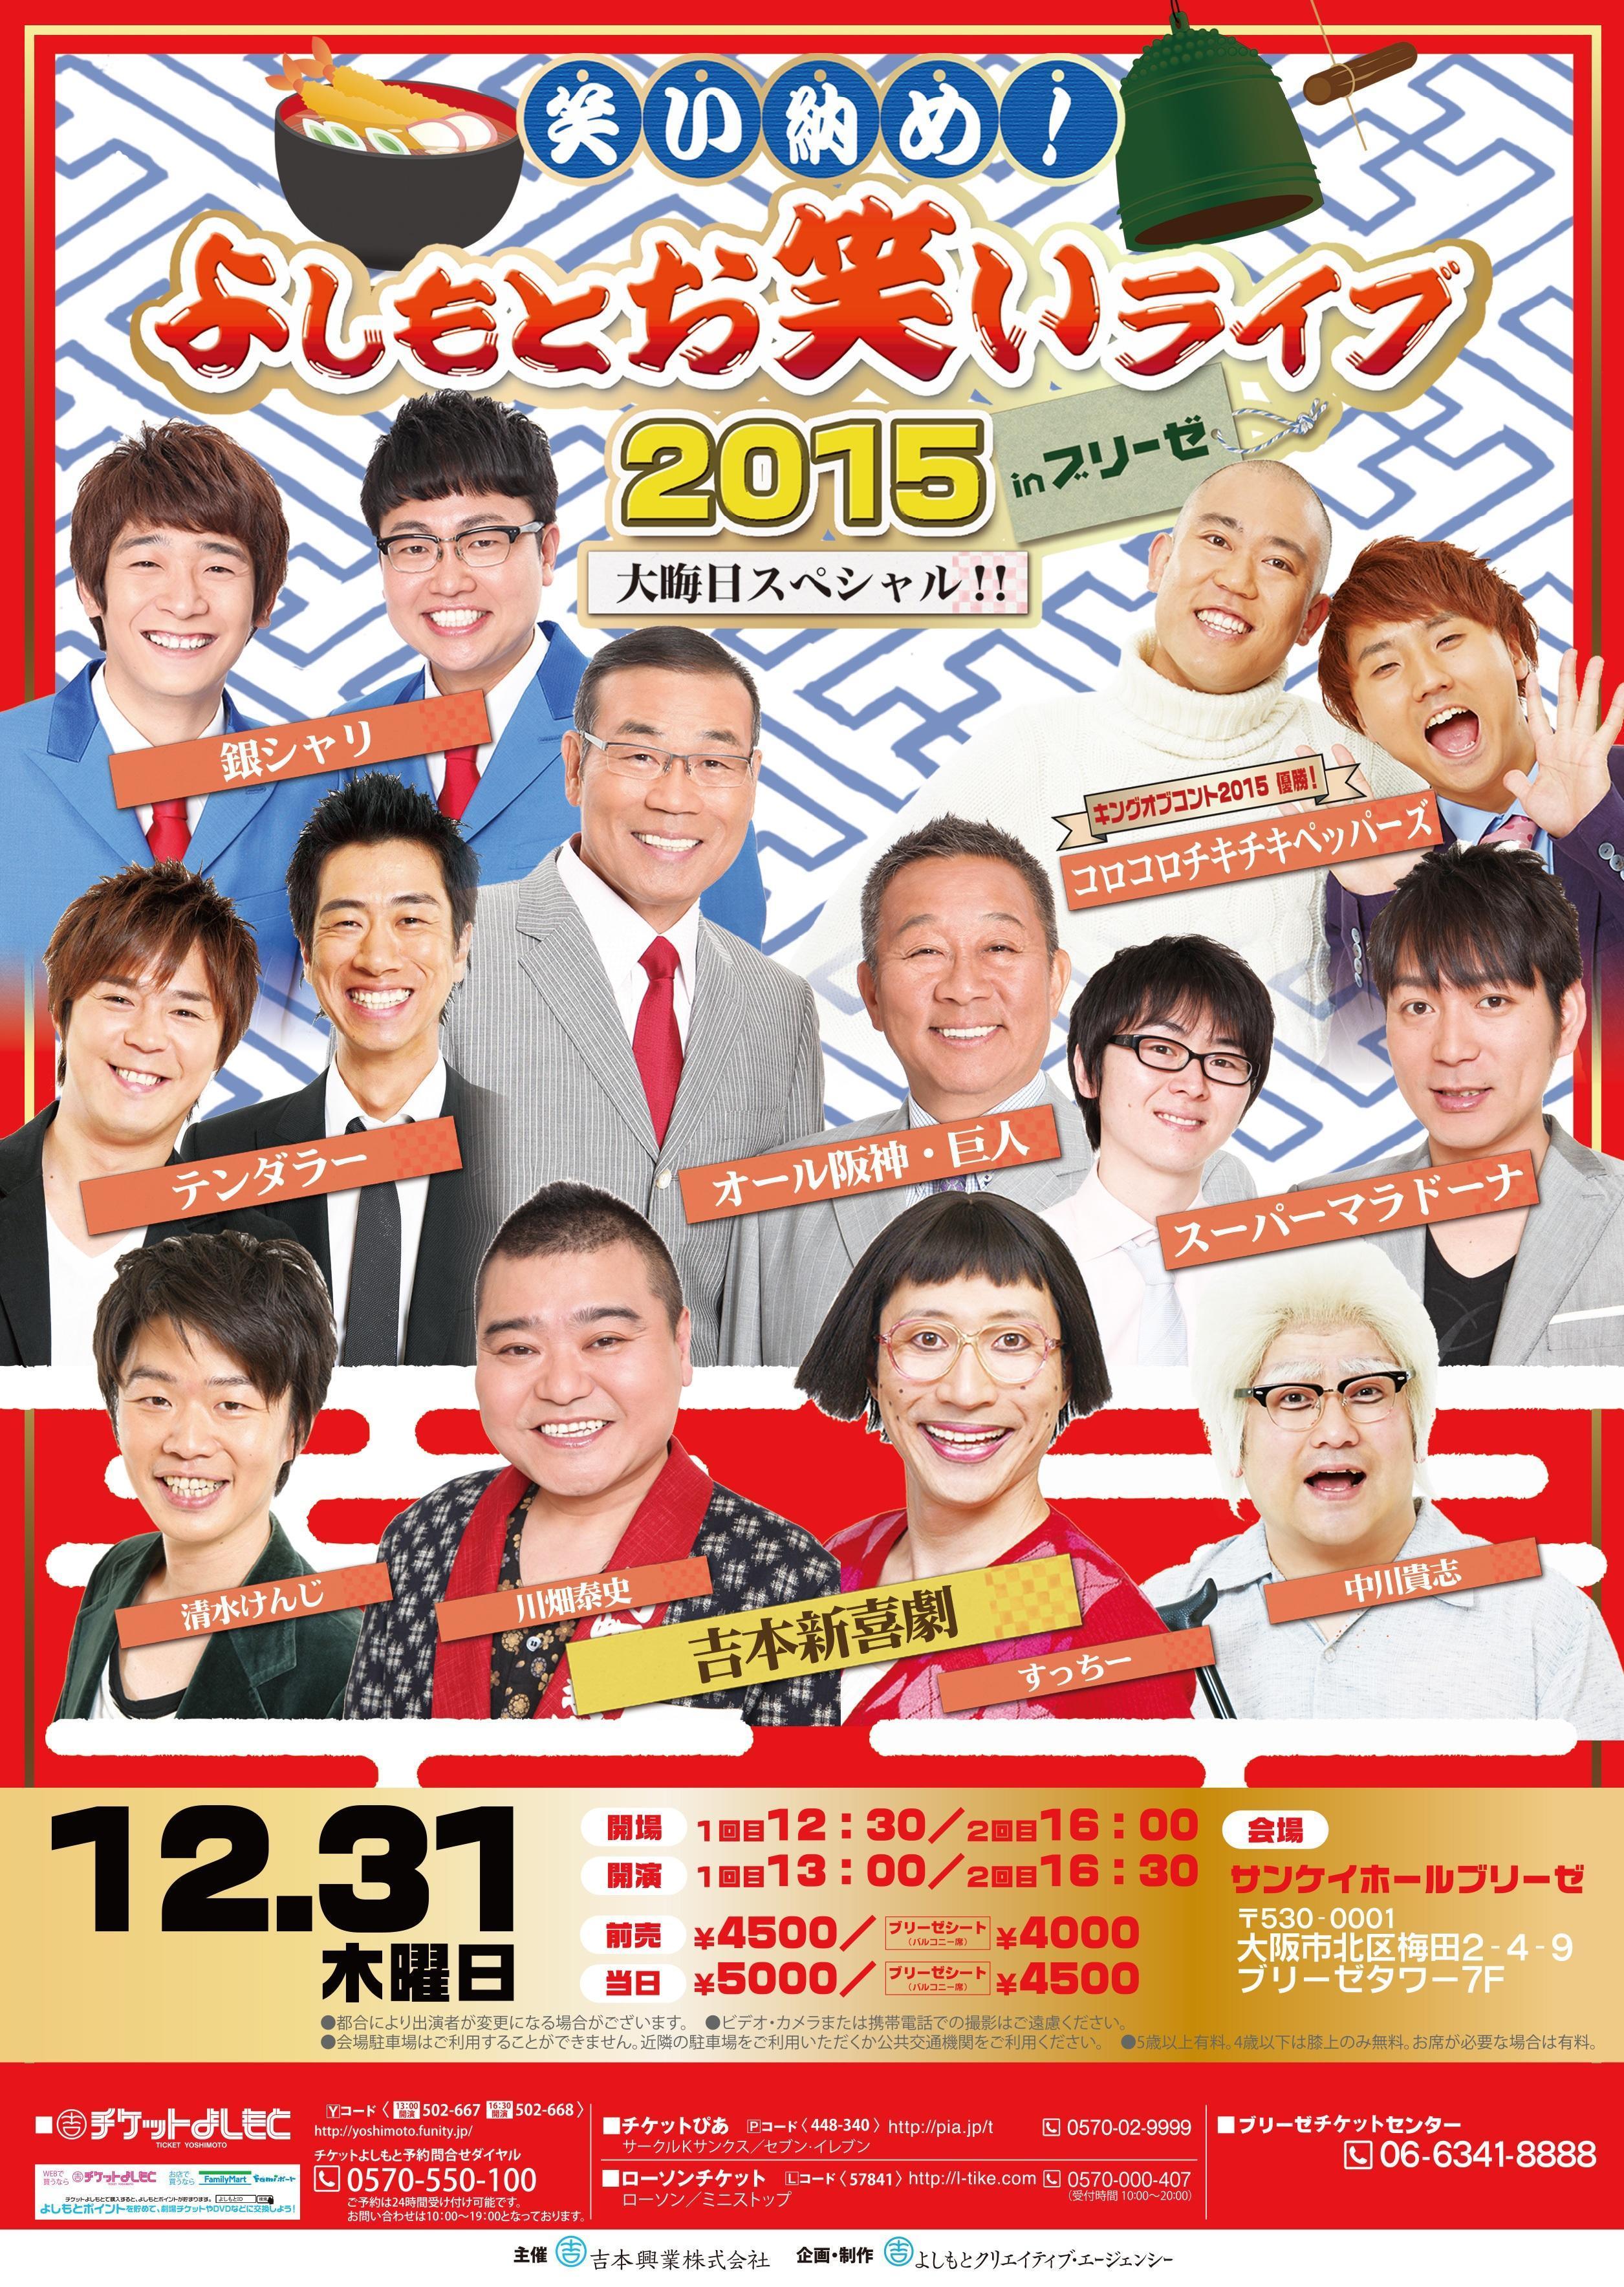 http://www.syumatsu.jp/20151207160540-fd8fa95ccb25ea99fbf72bcec402b49e1aa45835.jpg